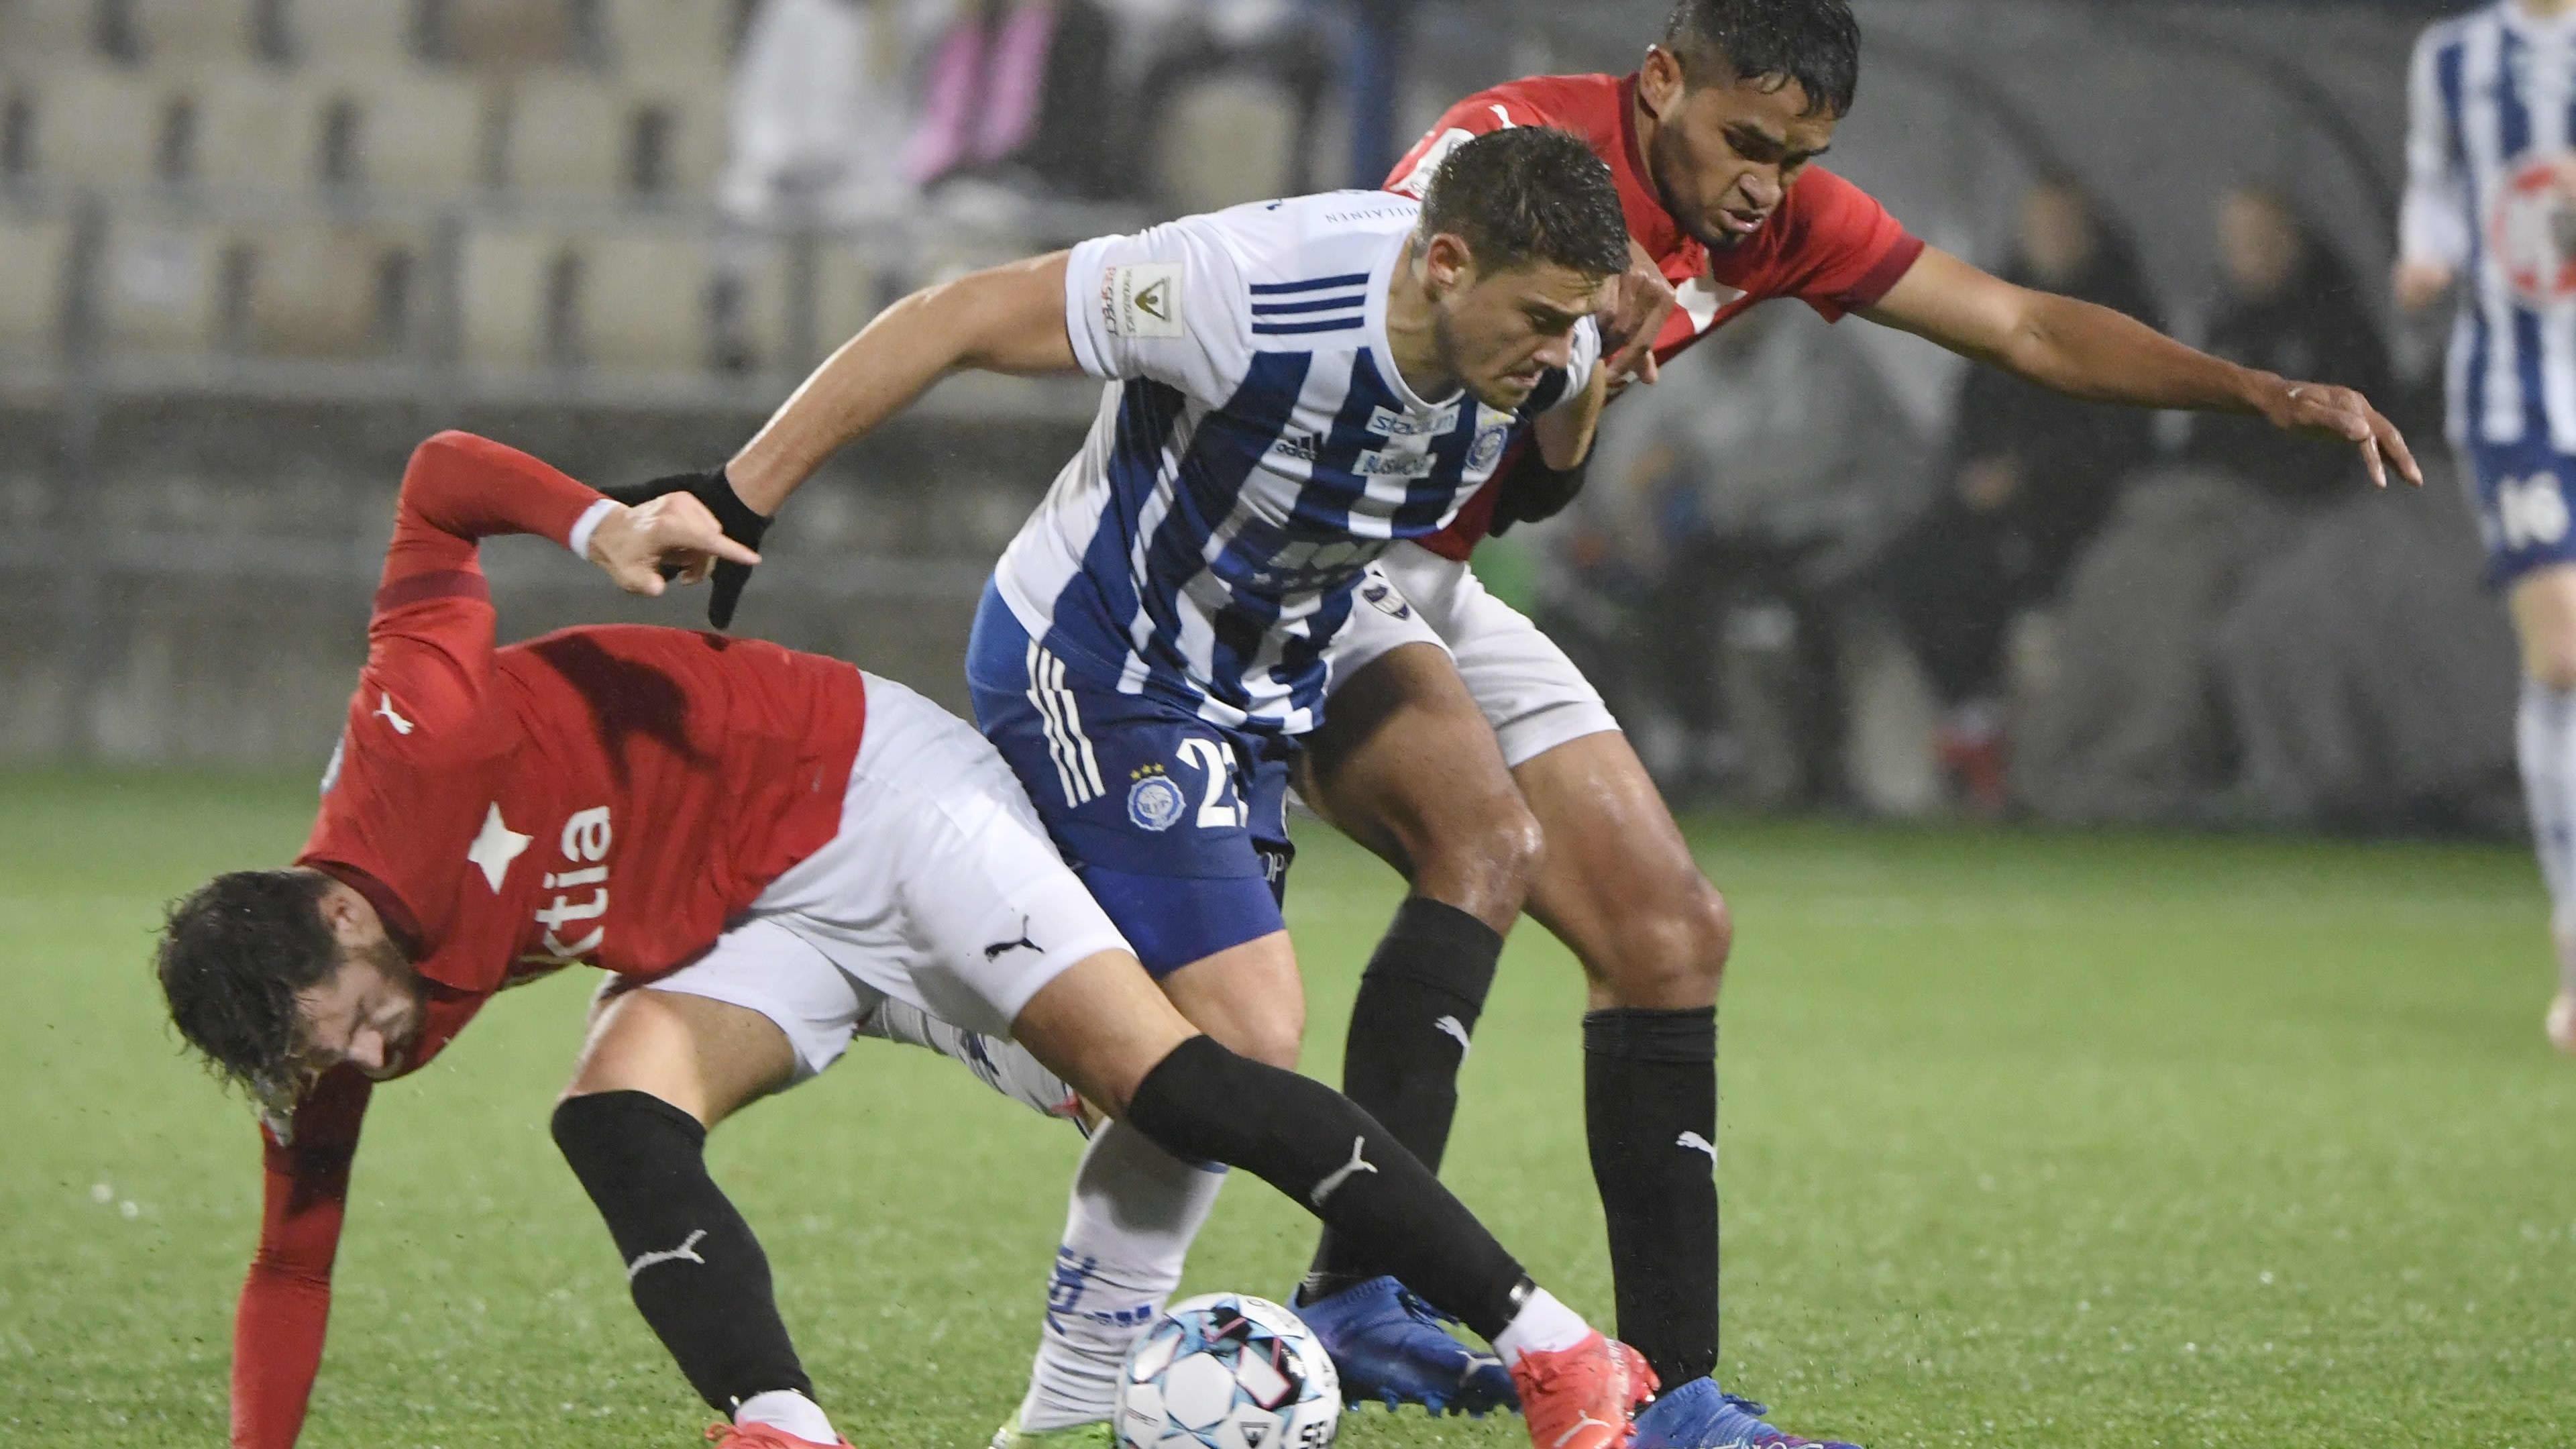 HJK:n Filip Valencic (kesk.) kamppailee pallosta HIFK:n Aldayr Hernandezin ja Felipe Saezin kanssa.